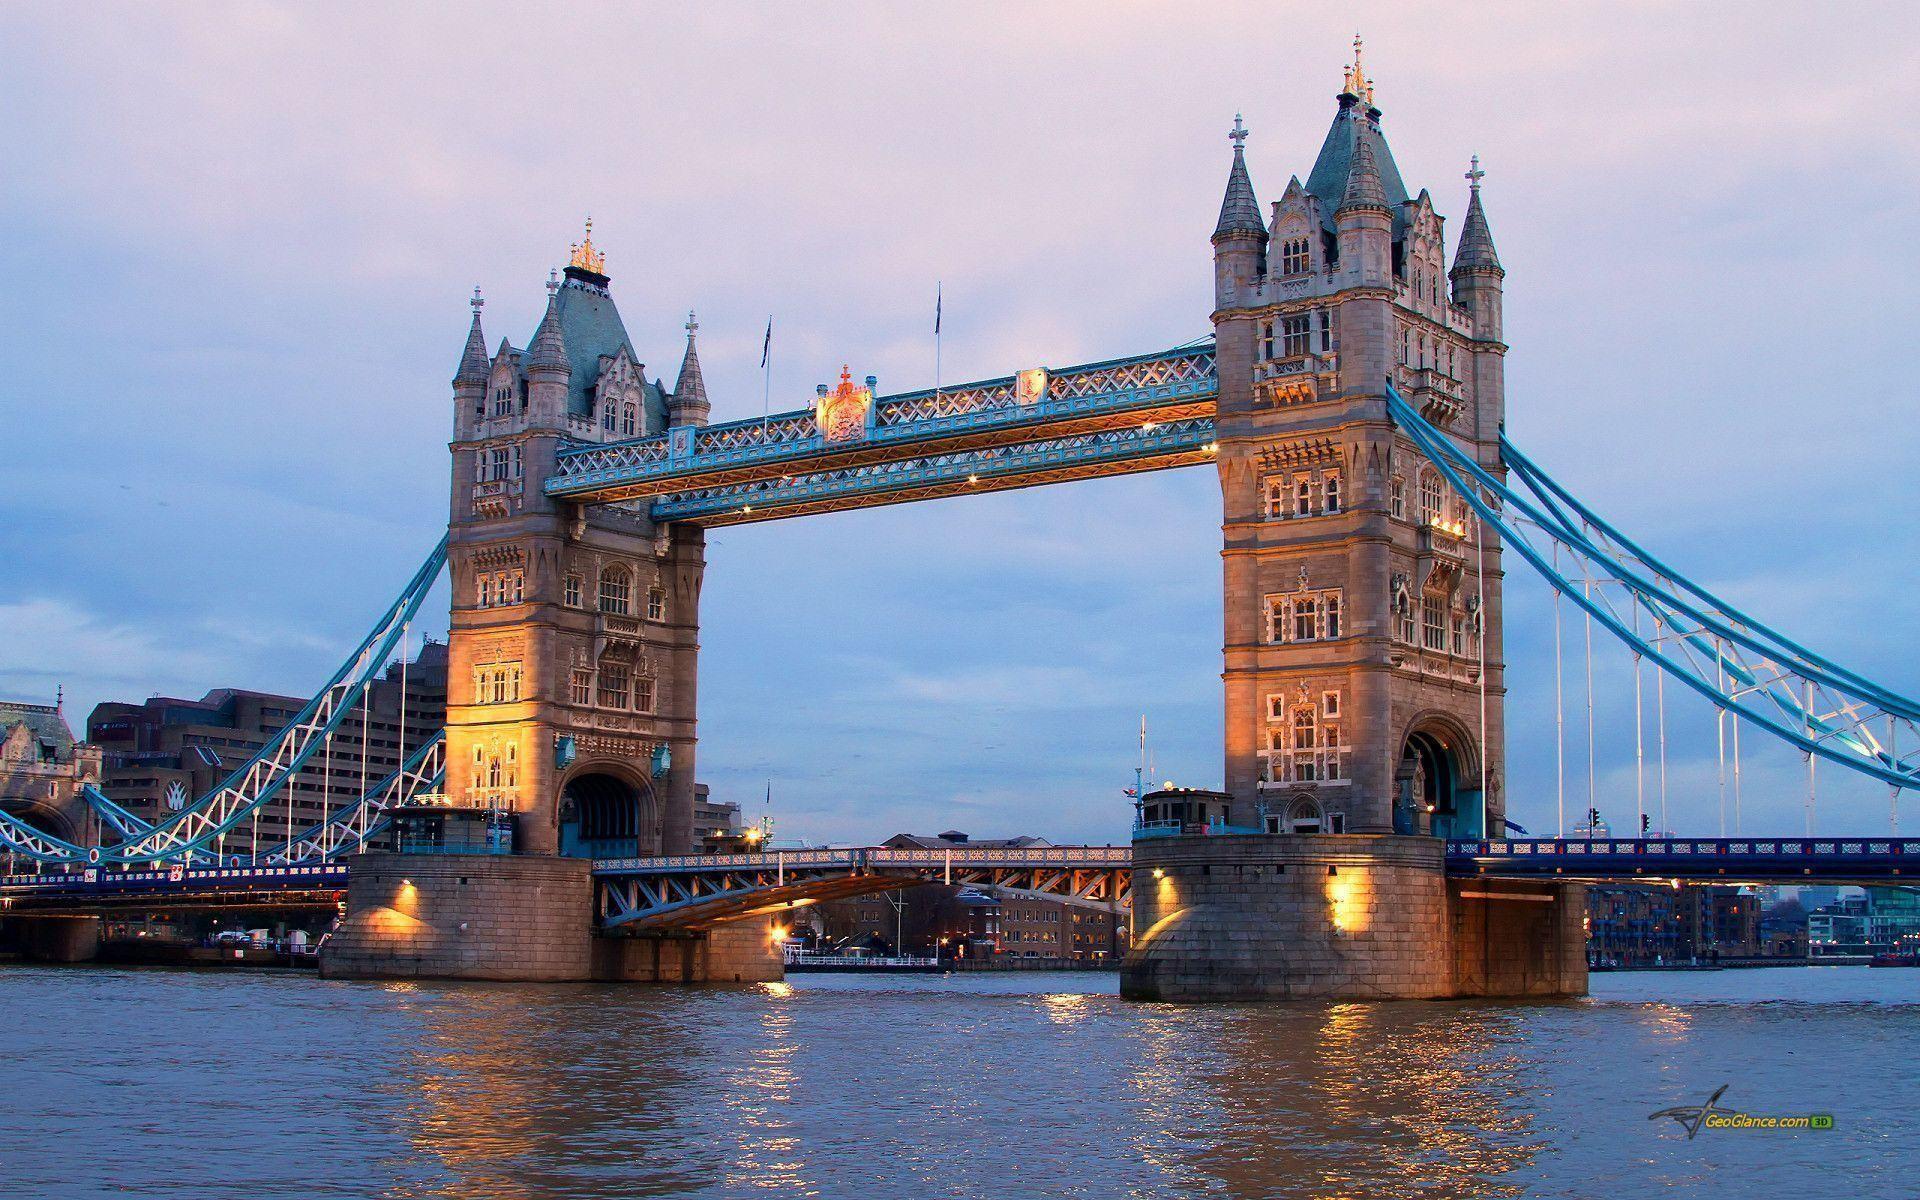 Res: 1920x1200, London Bridge Wallpapers - Full HD wallpaper search